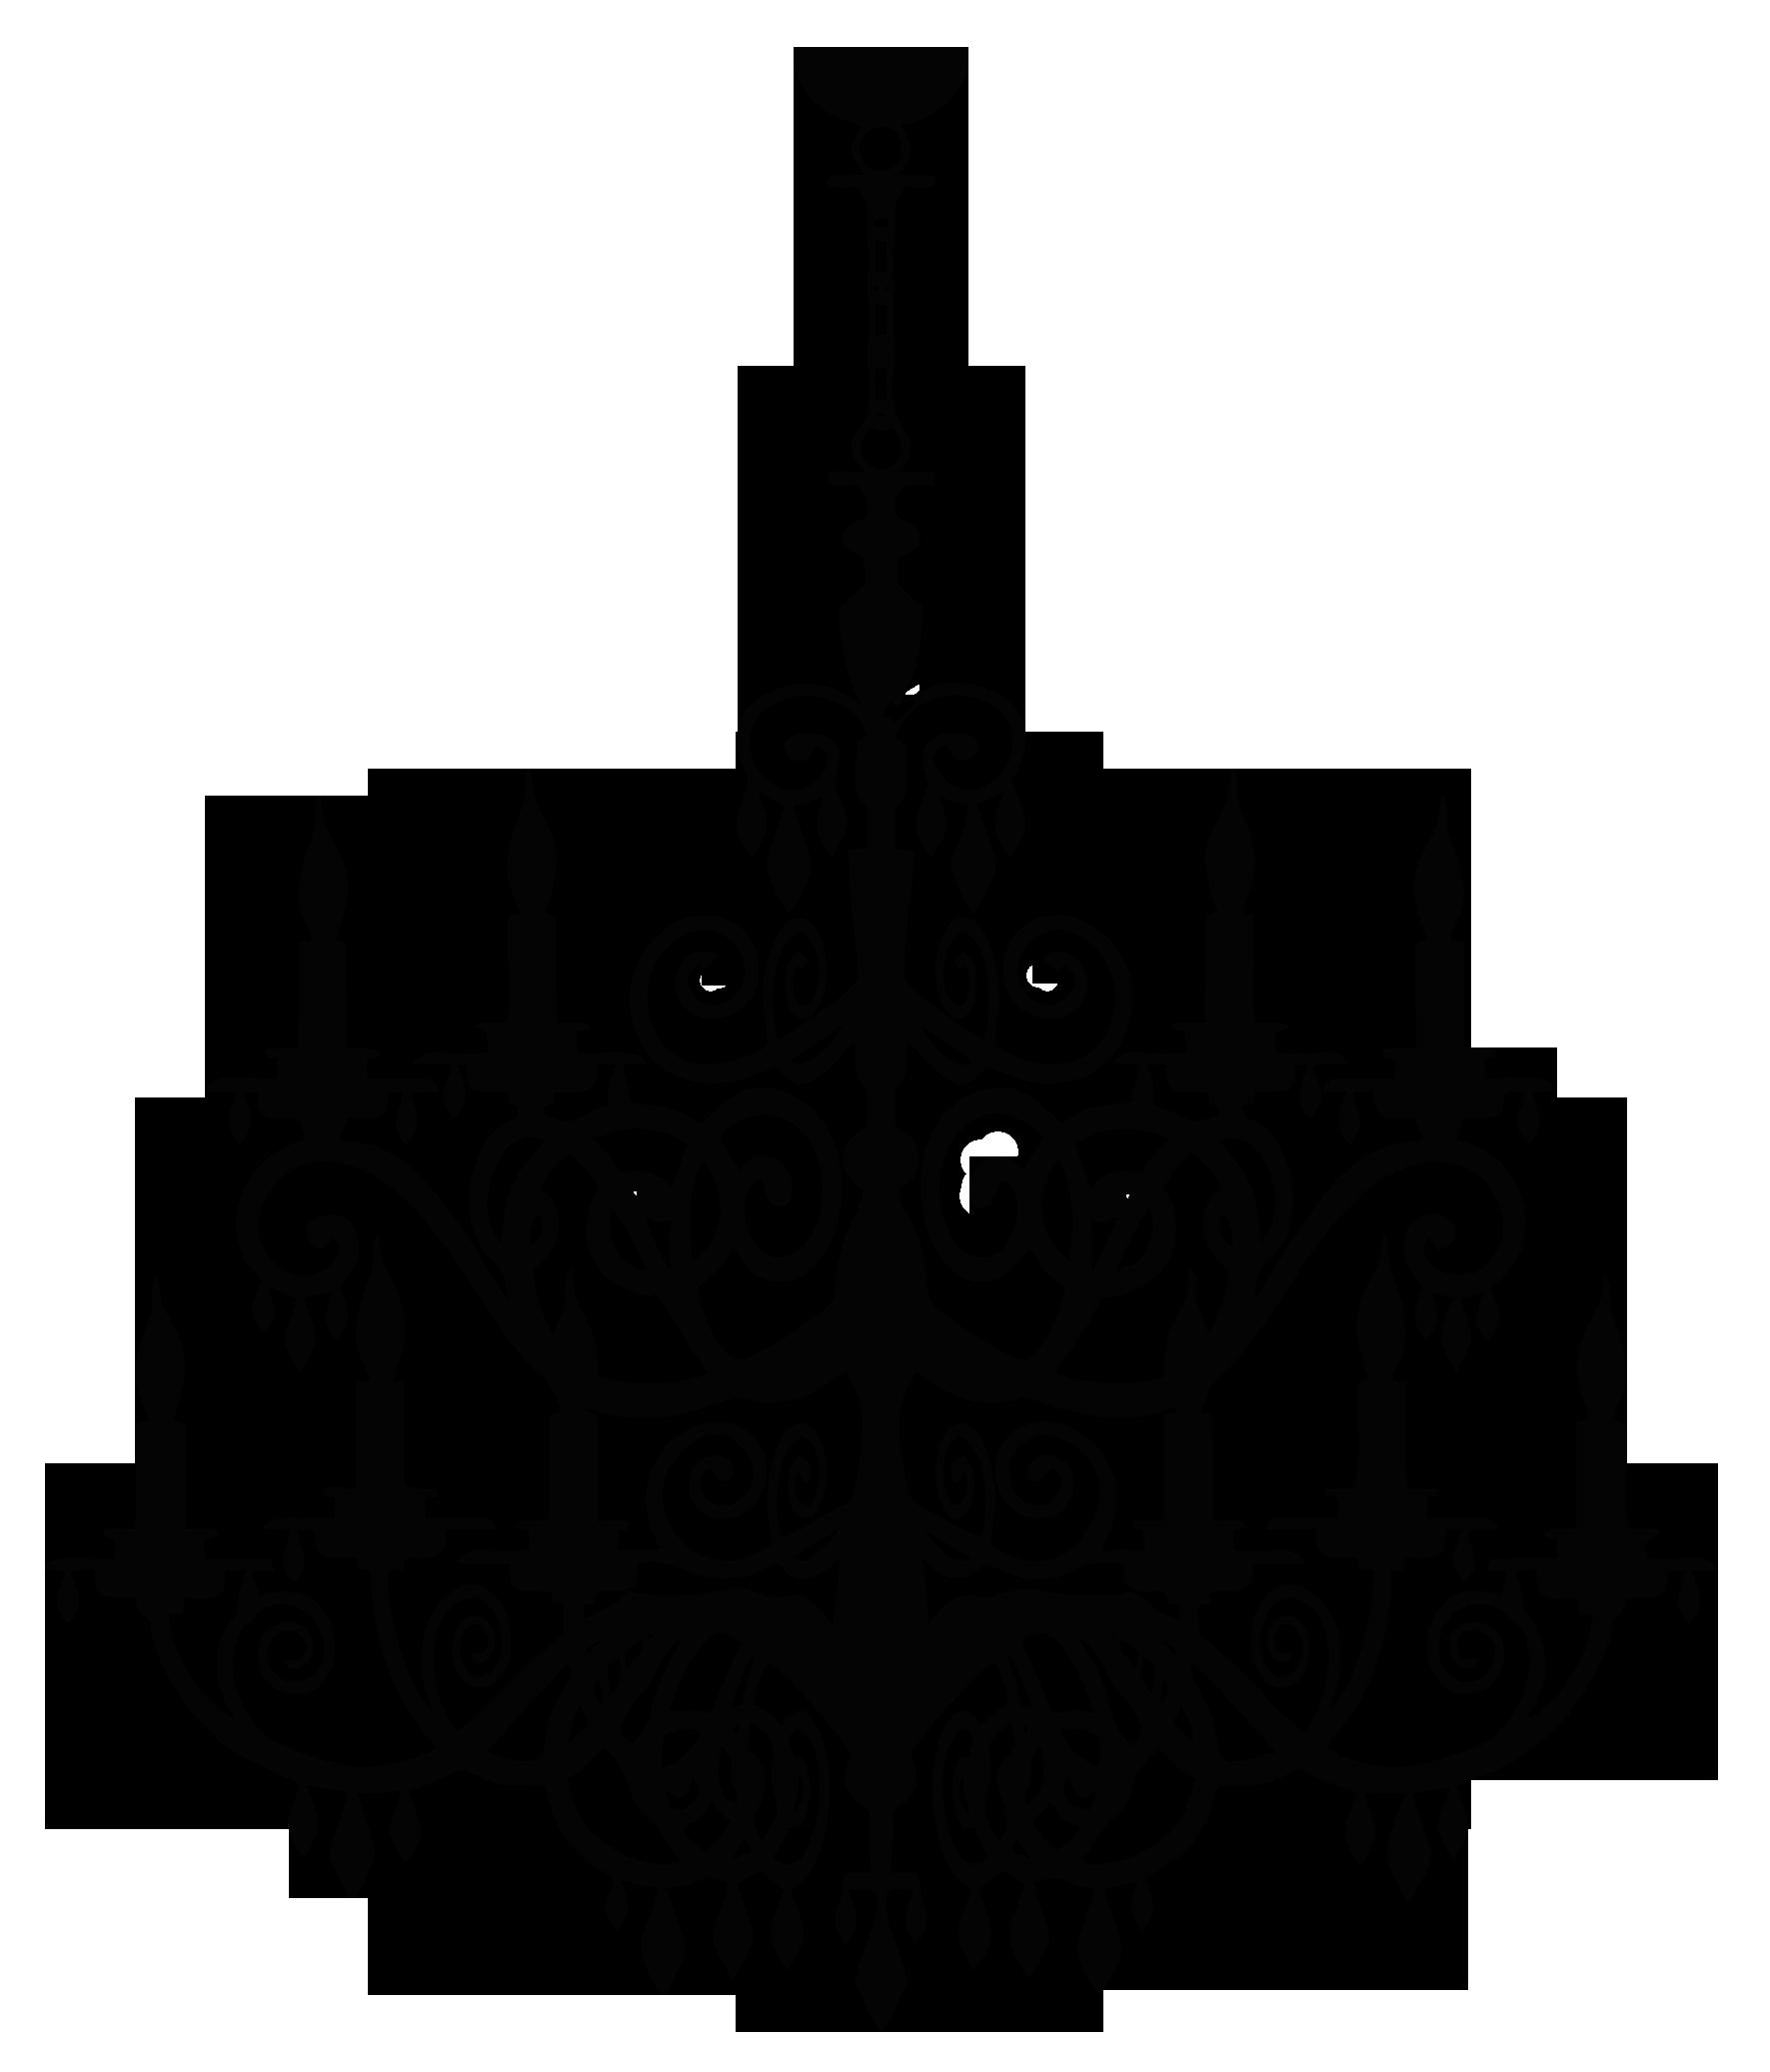 سكرابز شرائط دانتيل بدون تحميل بحث Google Baroque Chandelier Chandelier Wall Art Chandelier Decor